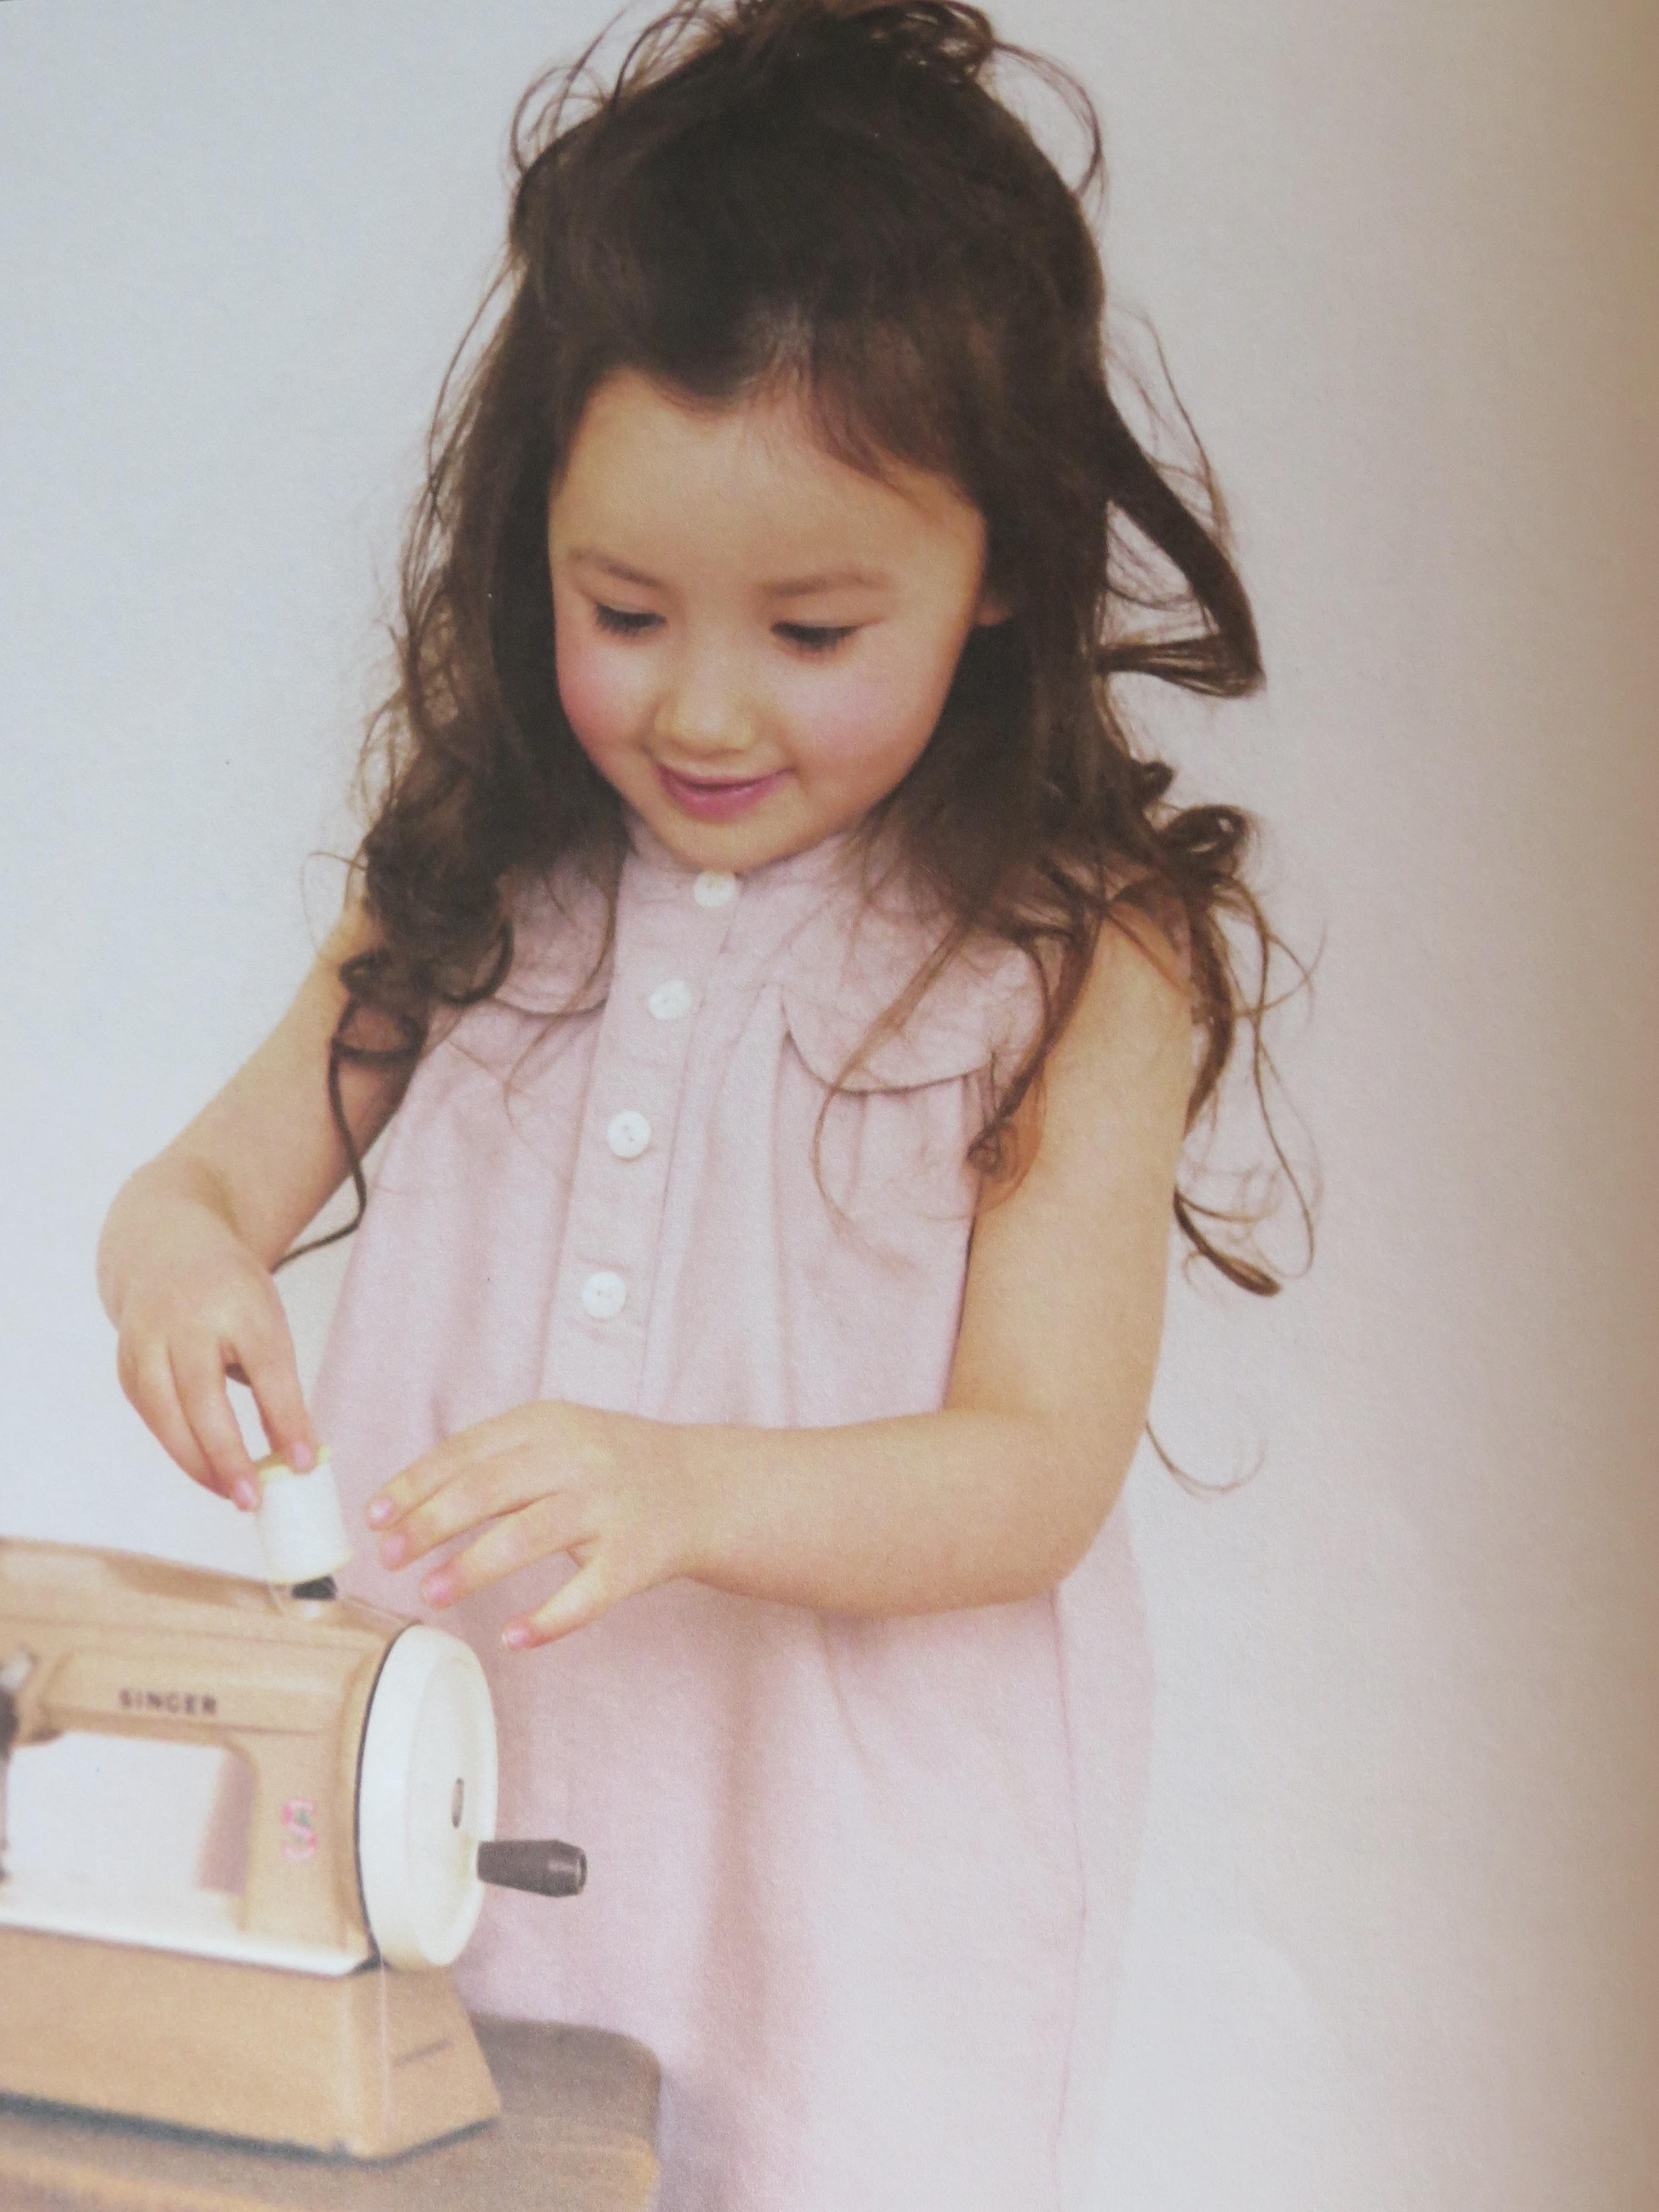 �sew sweet handmade clothes for girls� by yuki araki